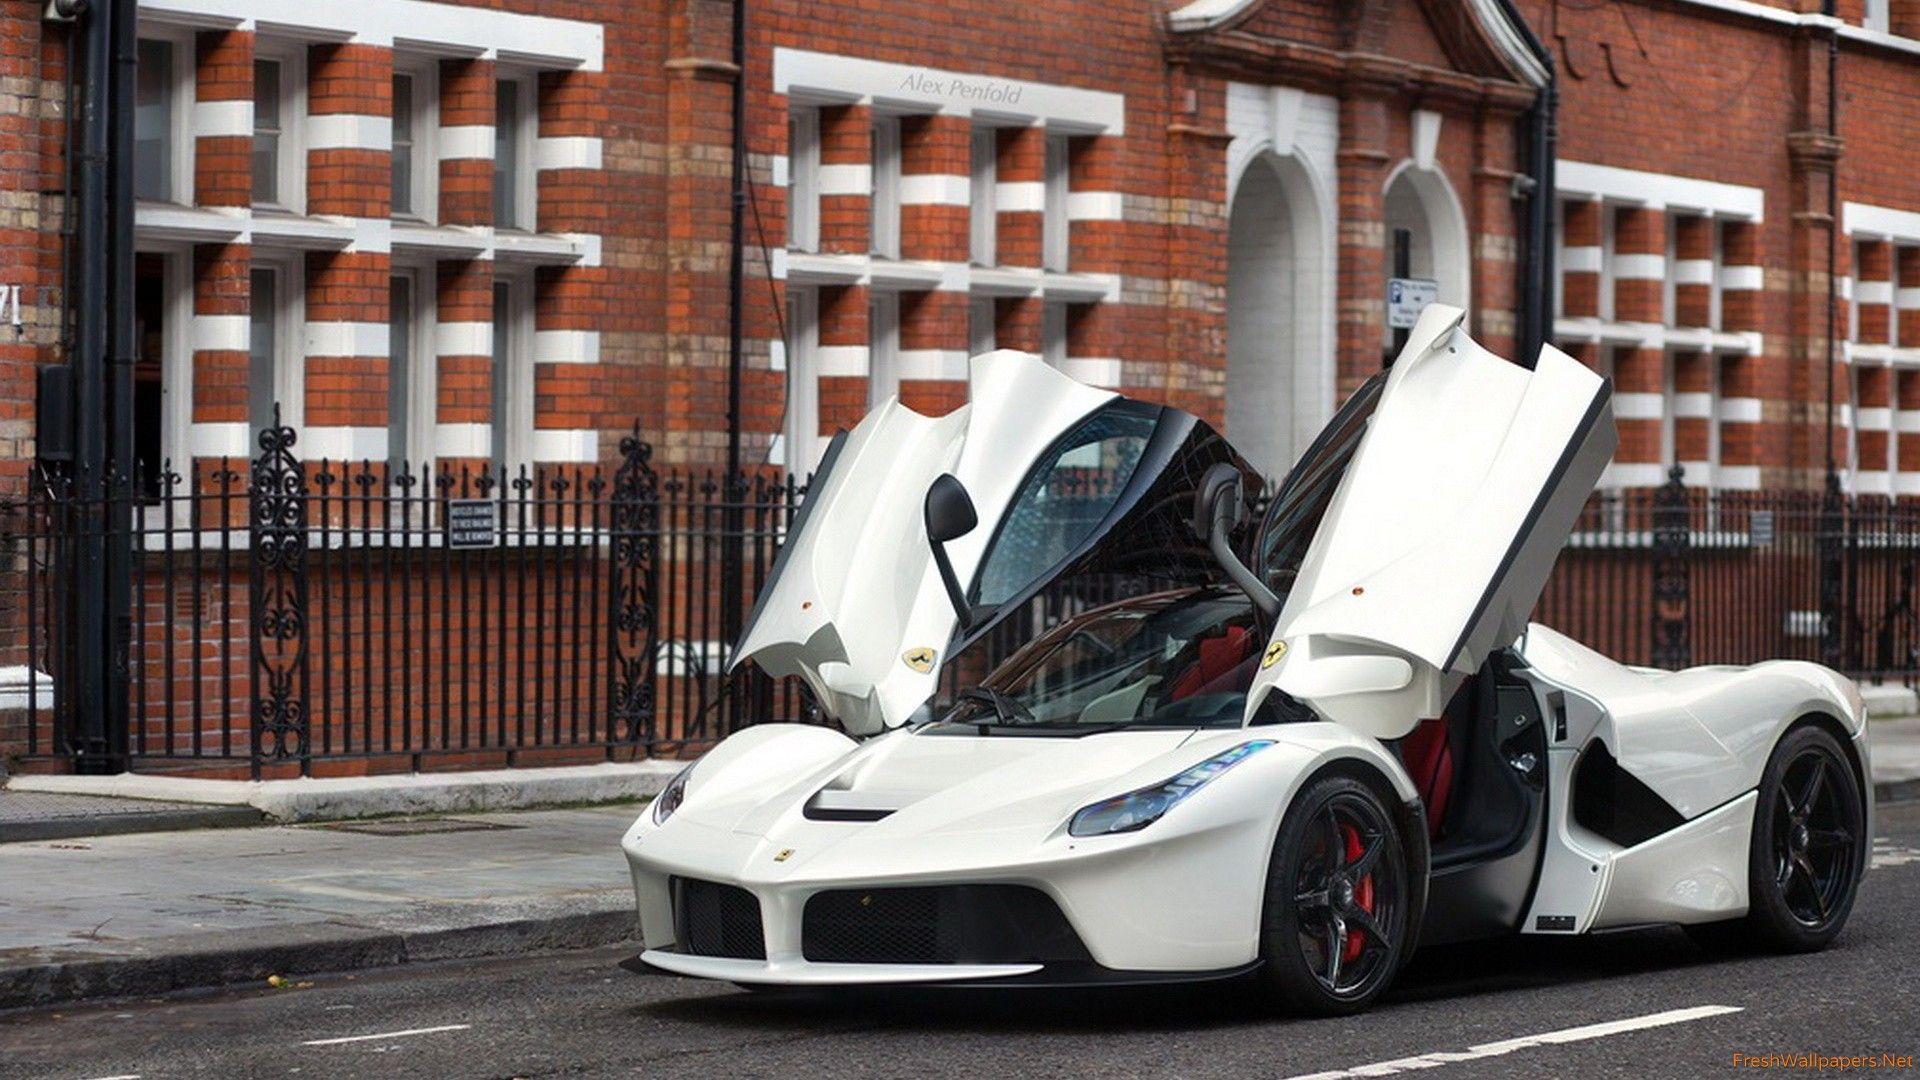 White Ferrari Laferrari Wallpapers Top Free White Ferrari Laferrari Backgrounds Wallpaperaccess